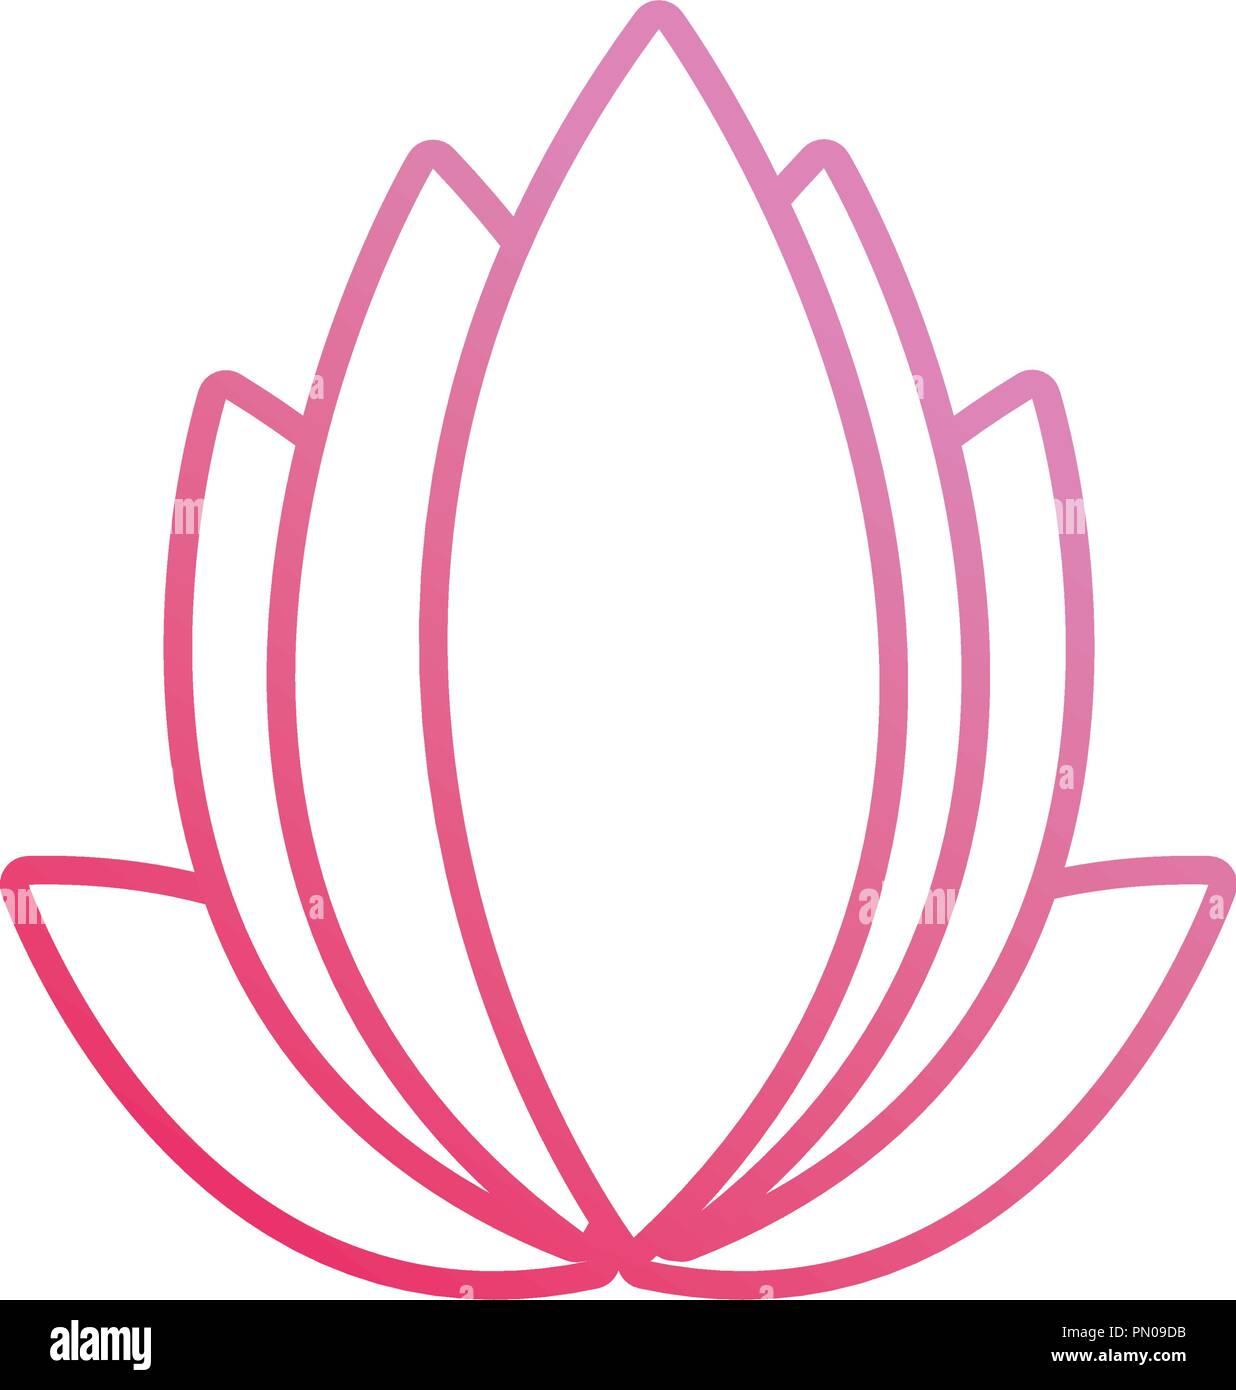 Lotus Flower Illustration Stock Photos Lotus Flower Illustration